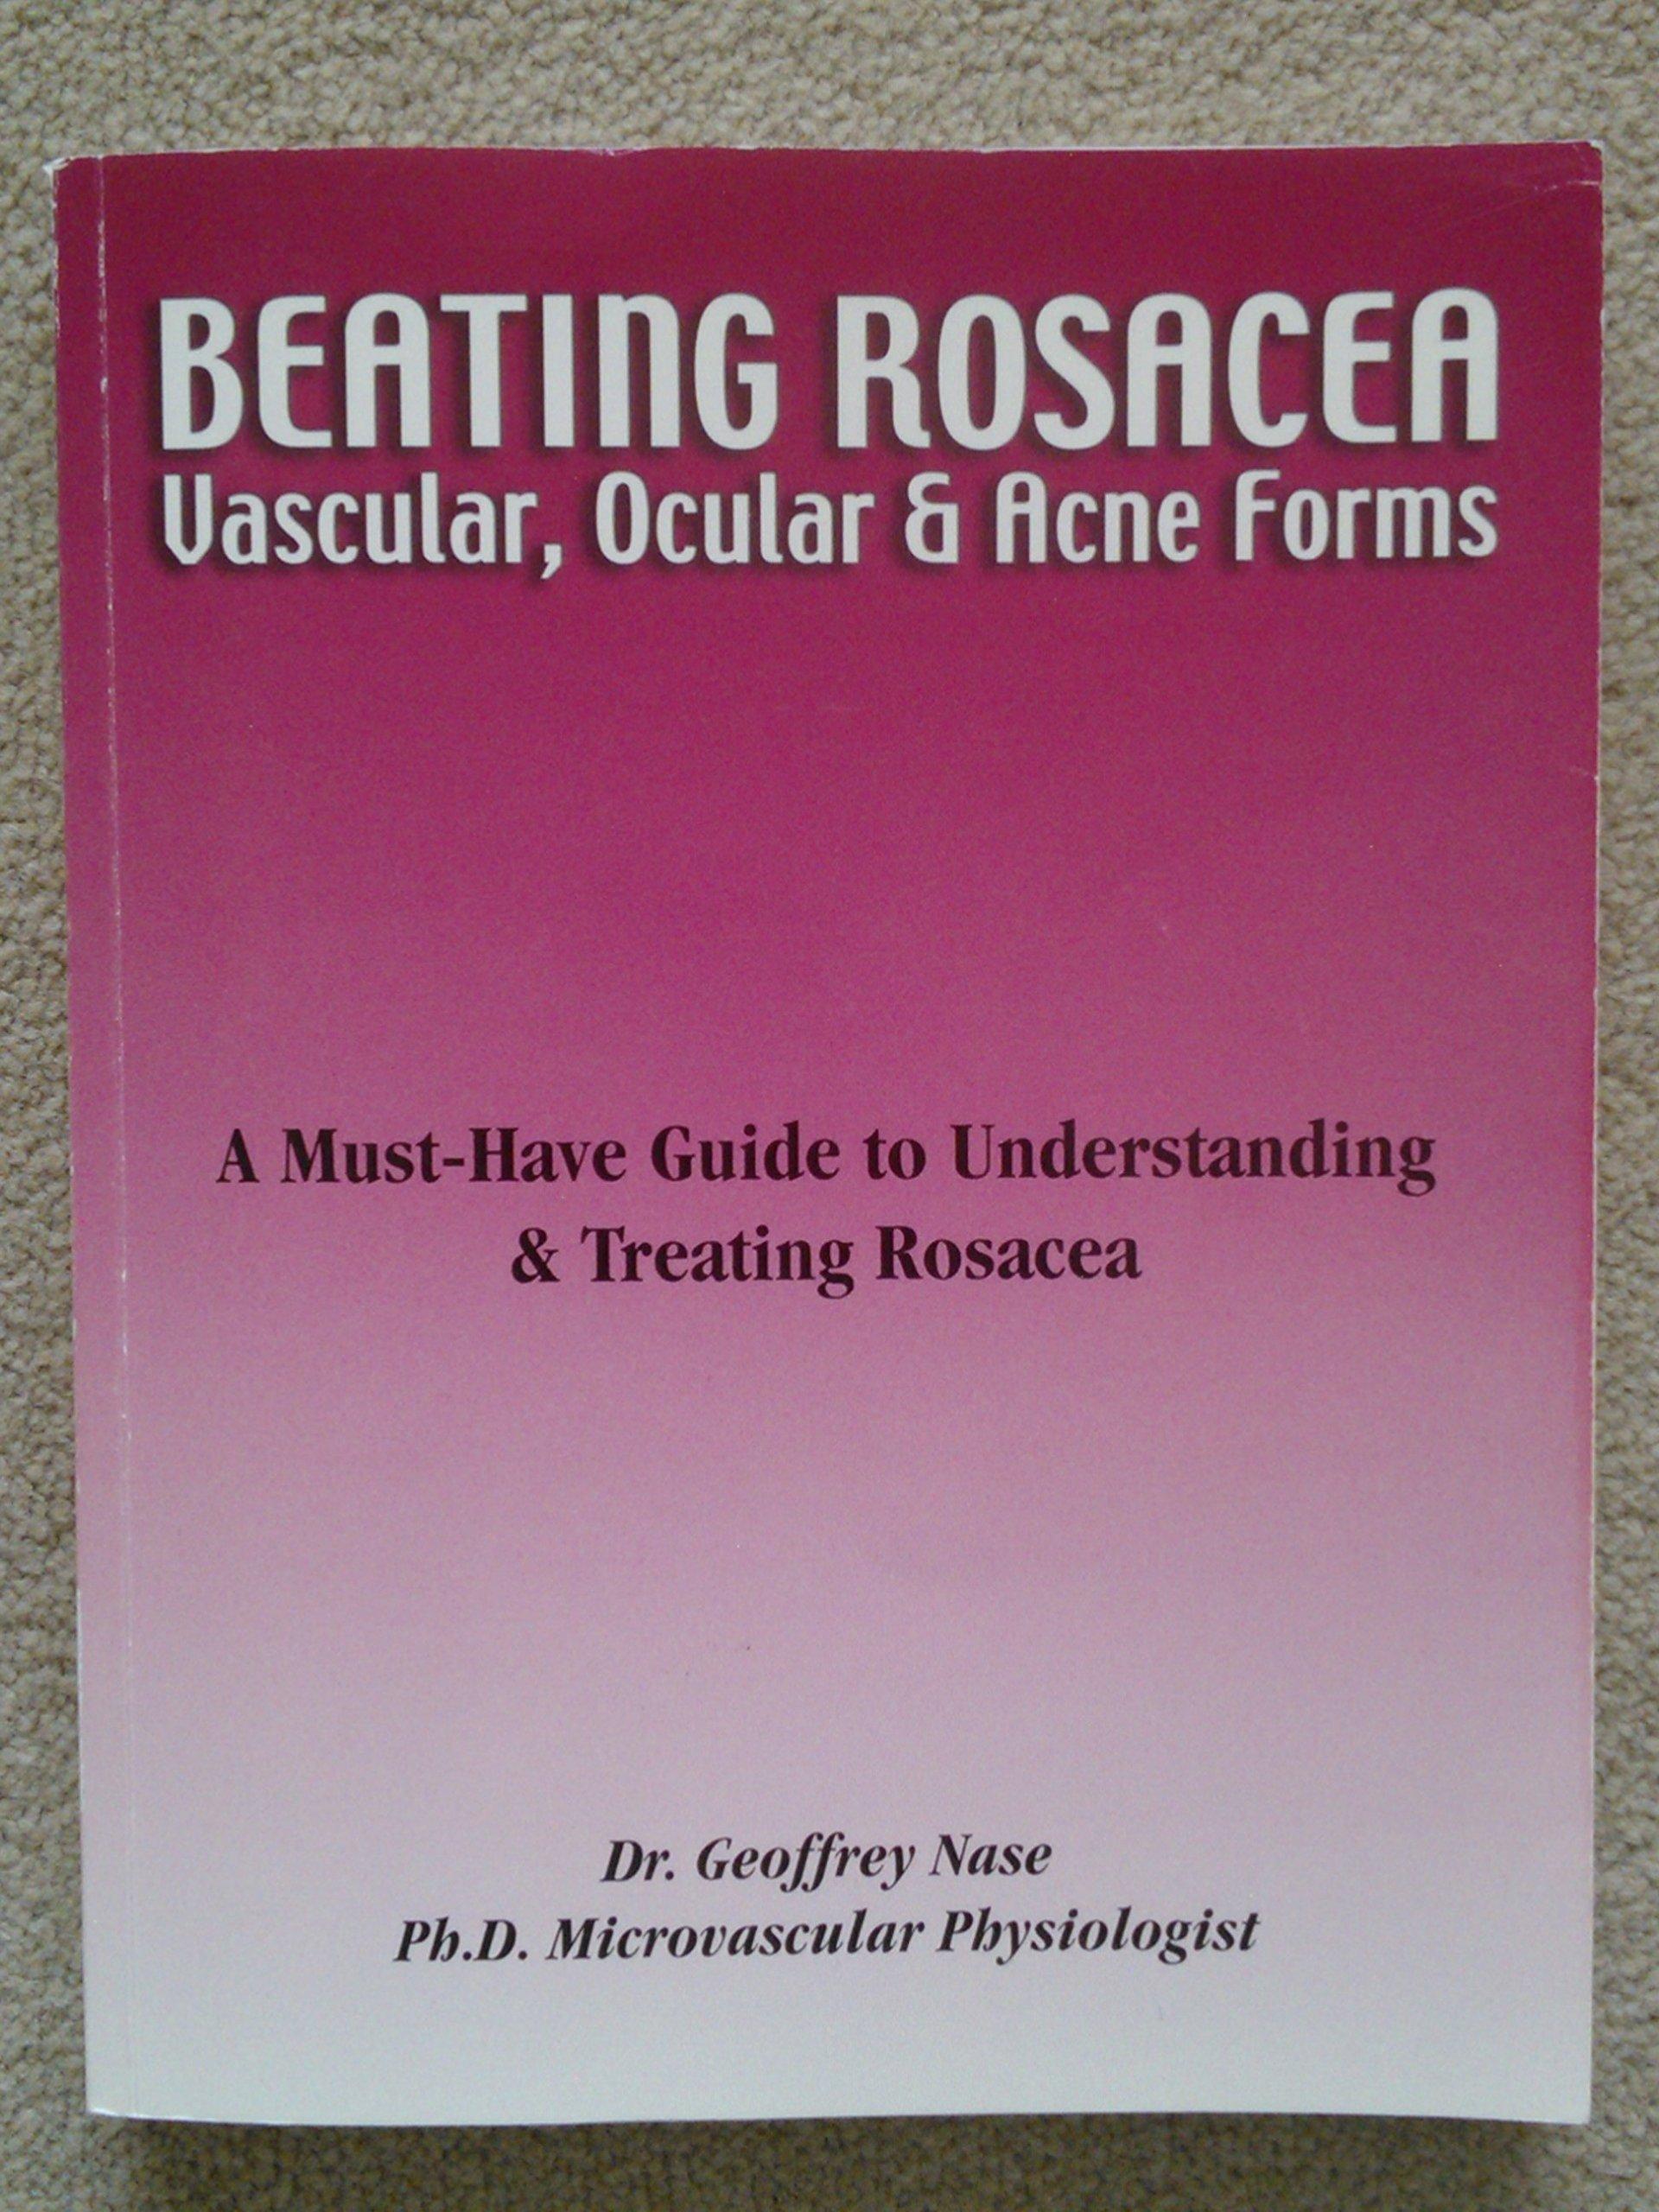 Beating Rosacea Vascular Ocular Acne Forms Geoffrey Nase